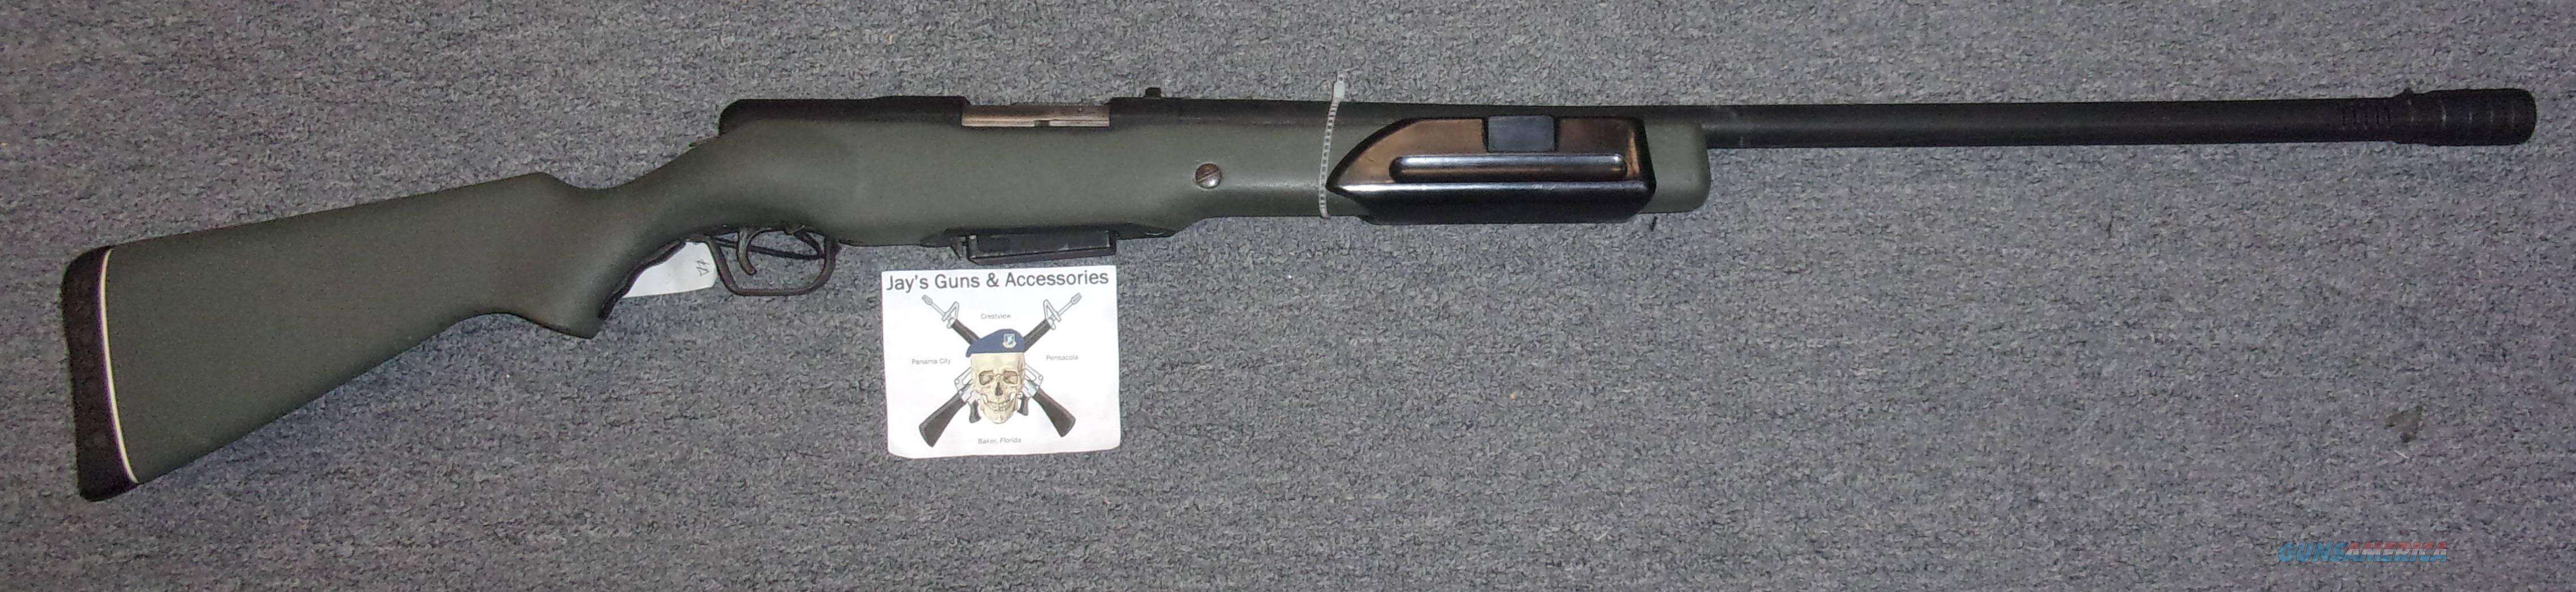 Mossberg 200 K  Guns > Shotguns > Mossberg Shotguns > Pump > Sporting